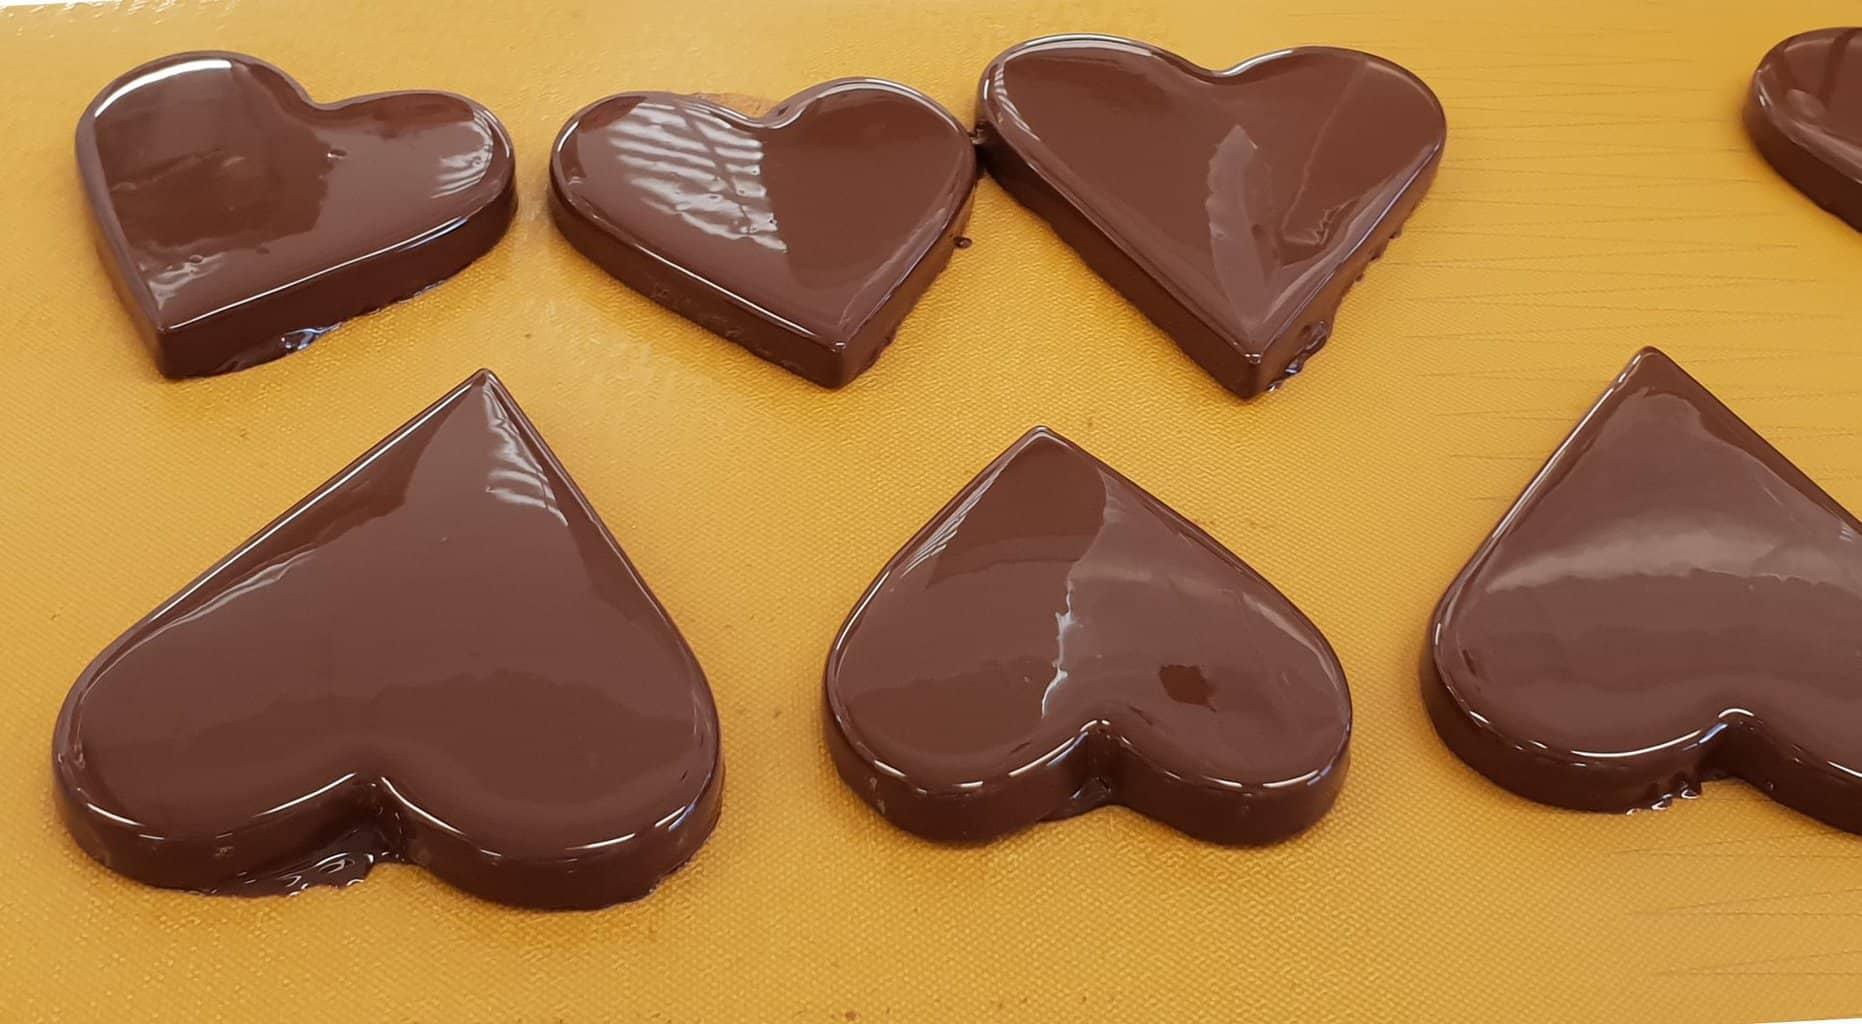 Behind the Scenes at Honold's Chocolate Atelier Küsnacht